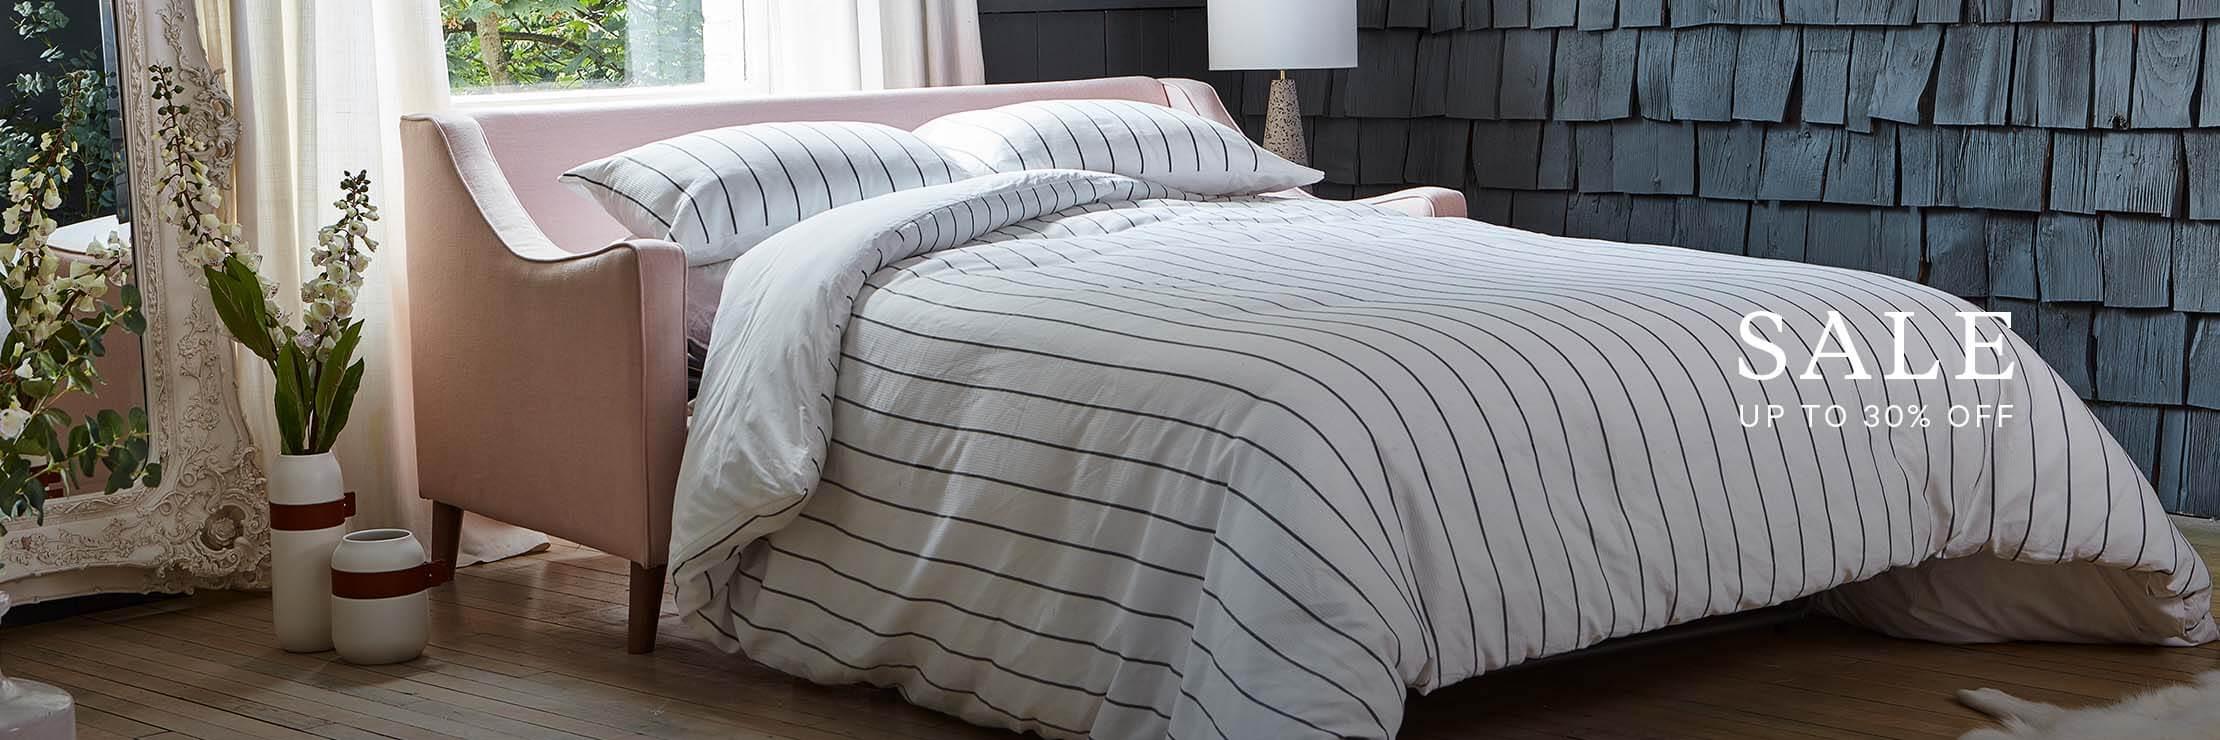 Weymouth Sofa Bed